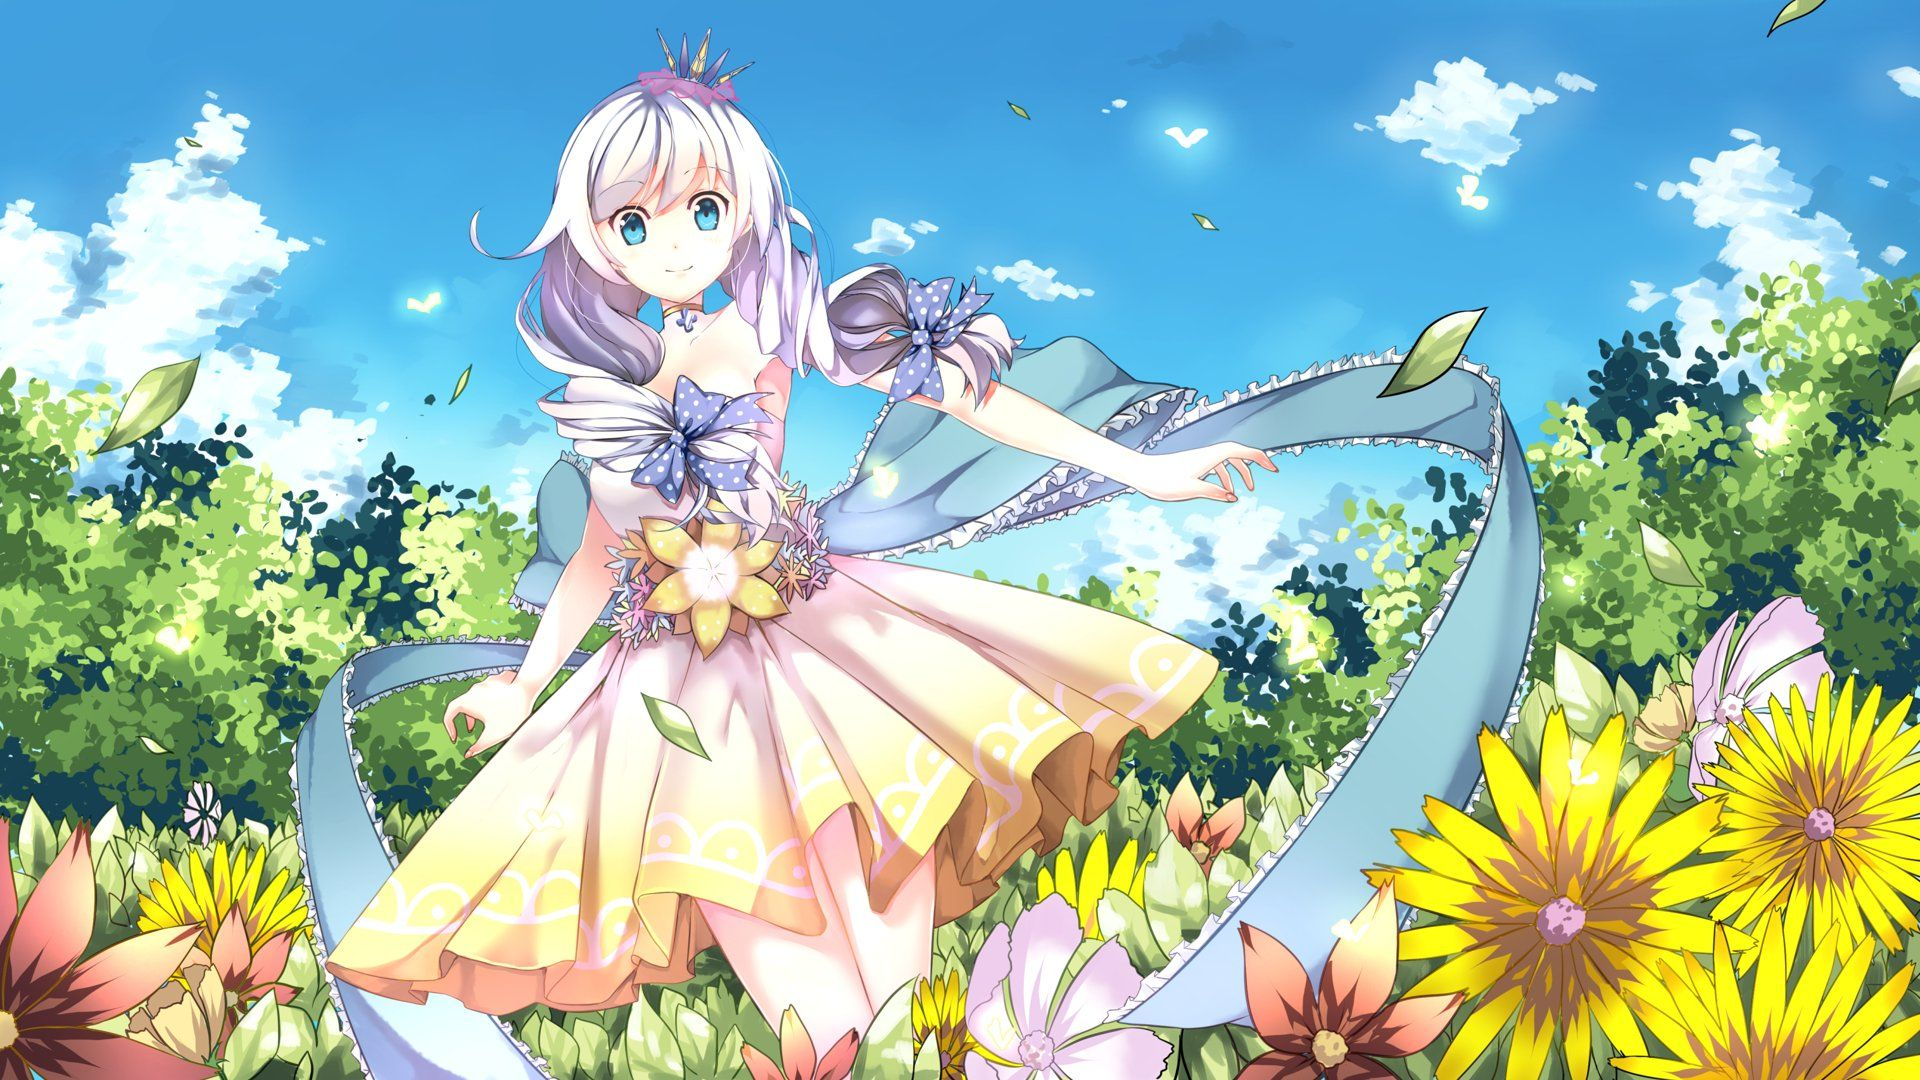 Hình nền anime cute cực dễ thương nhất full HD   アニメの女の子, 可愛いアニメガール,  芸術的アニメ少女